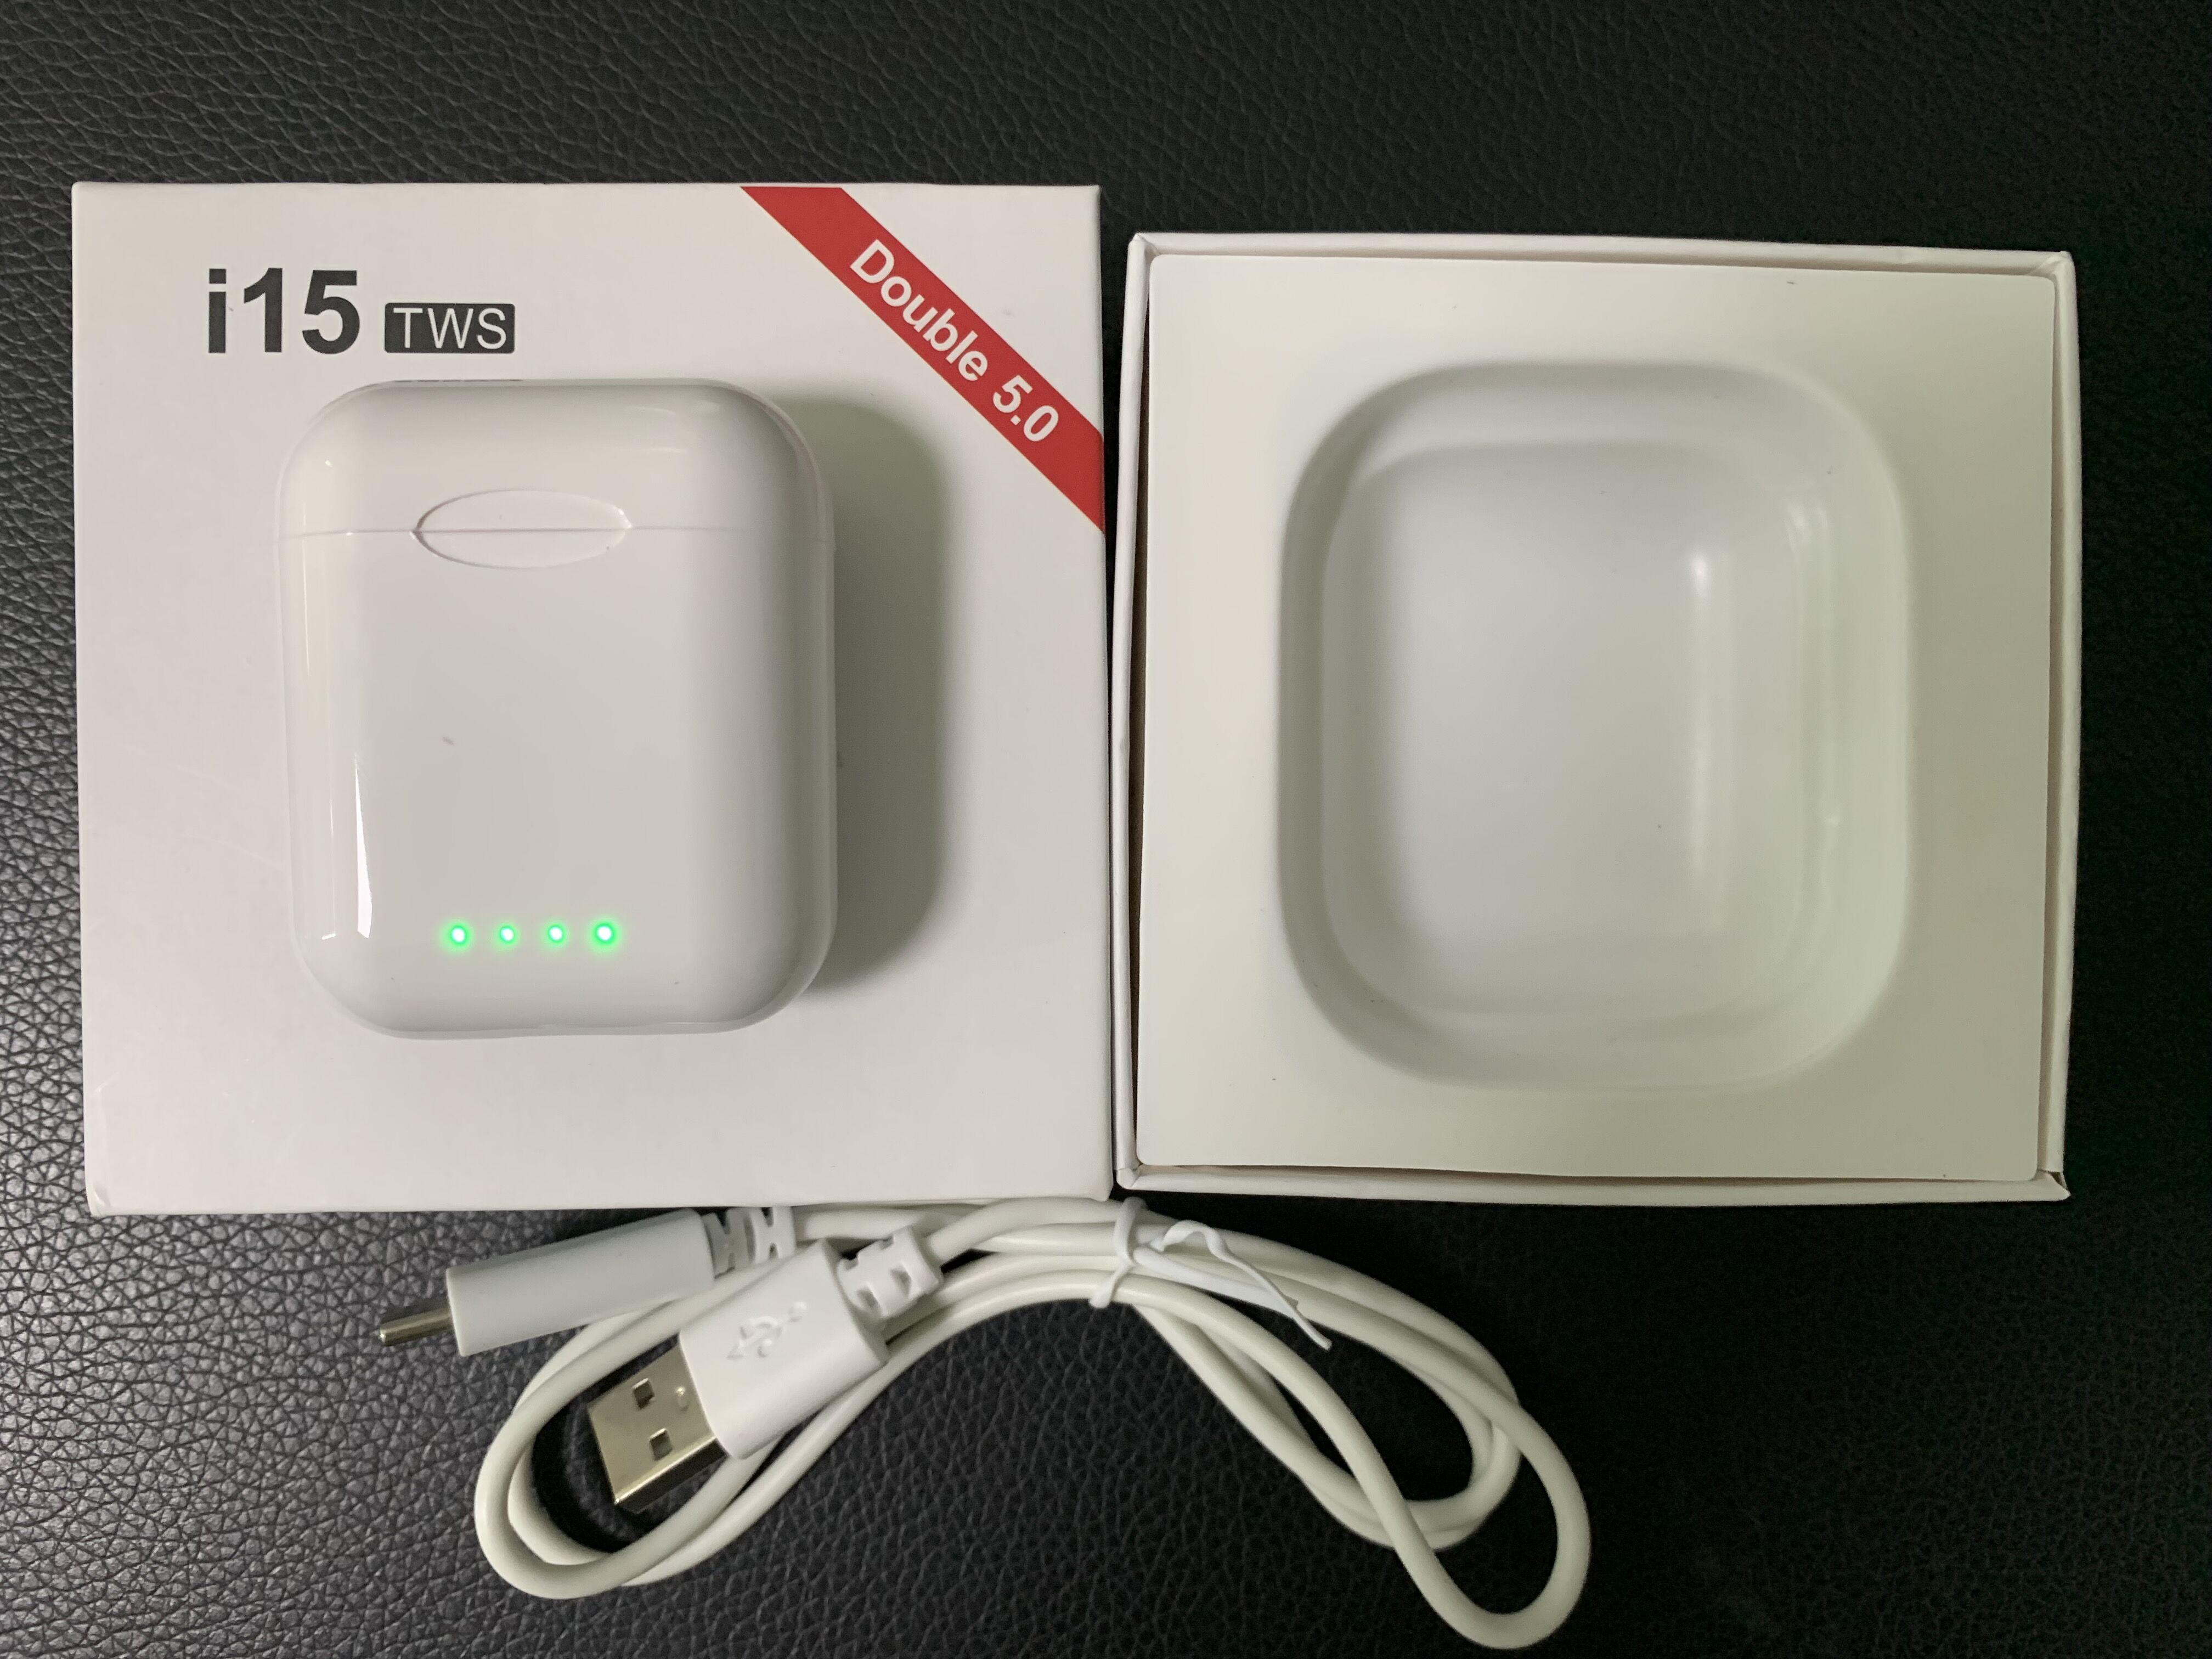 2019 NEW Touch control i15 TWS 1:1 Original Wireless charging support Bluetooth 5.0 3D bass earphone pk i10 i11 i12 i13 i14 tws